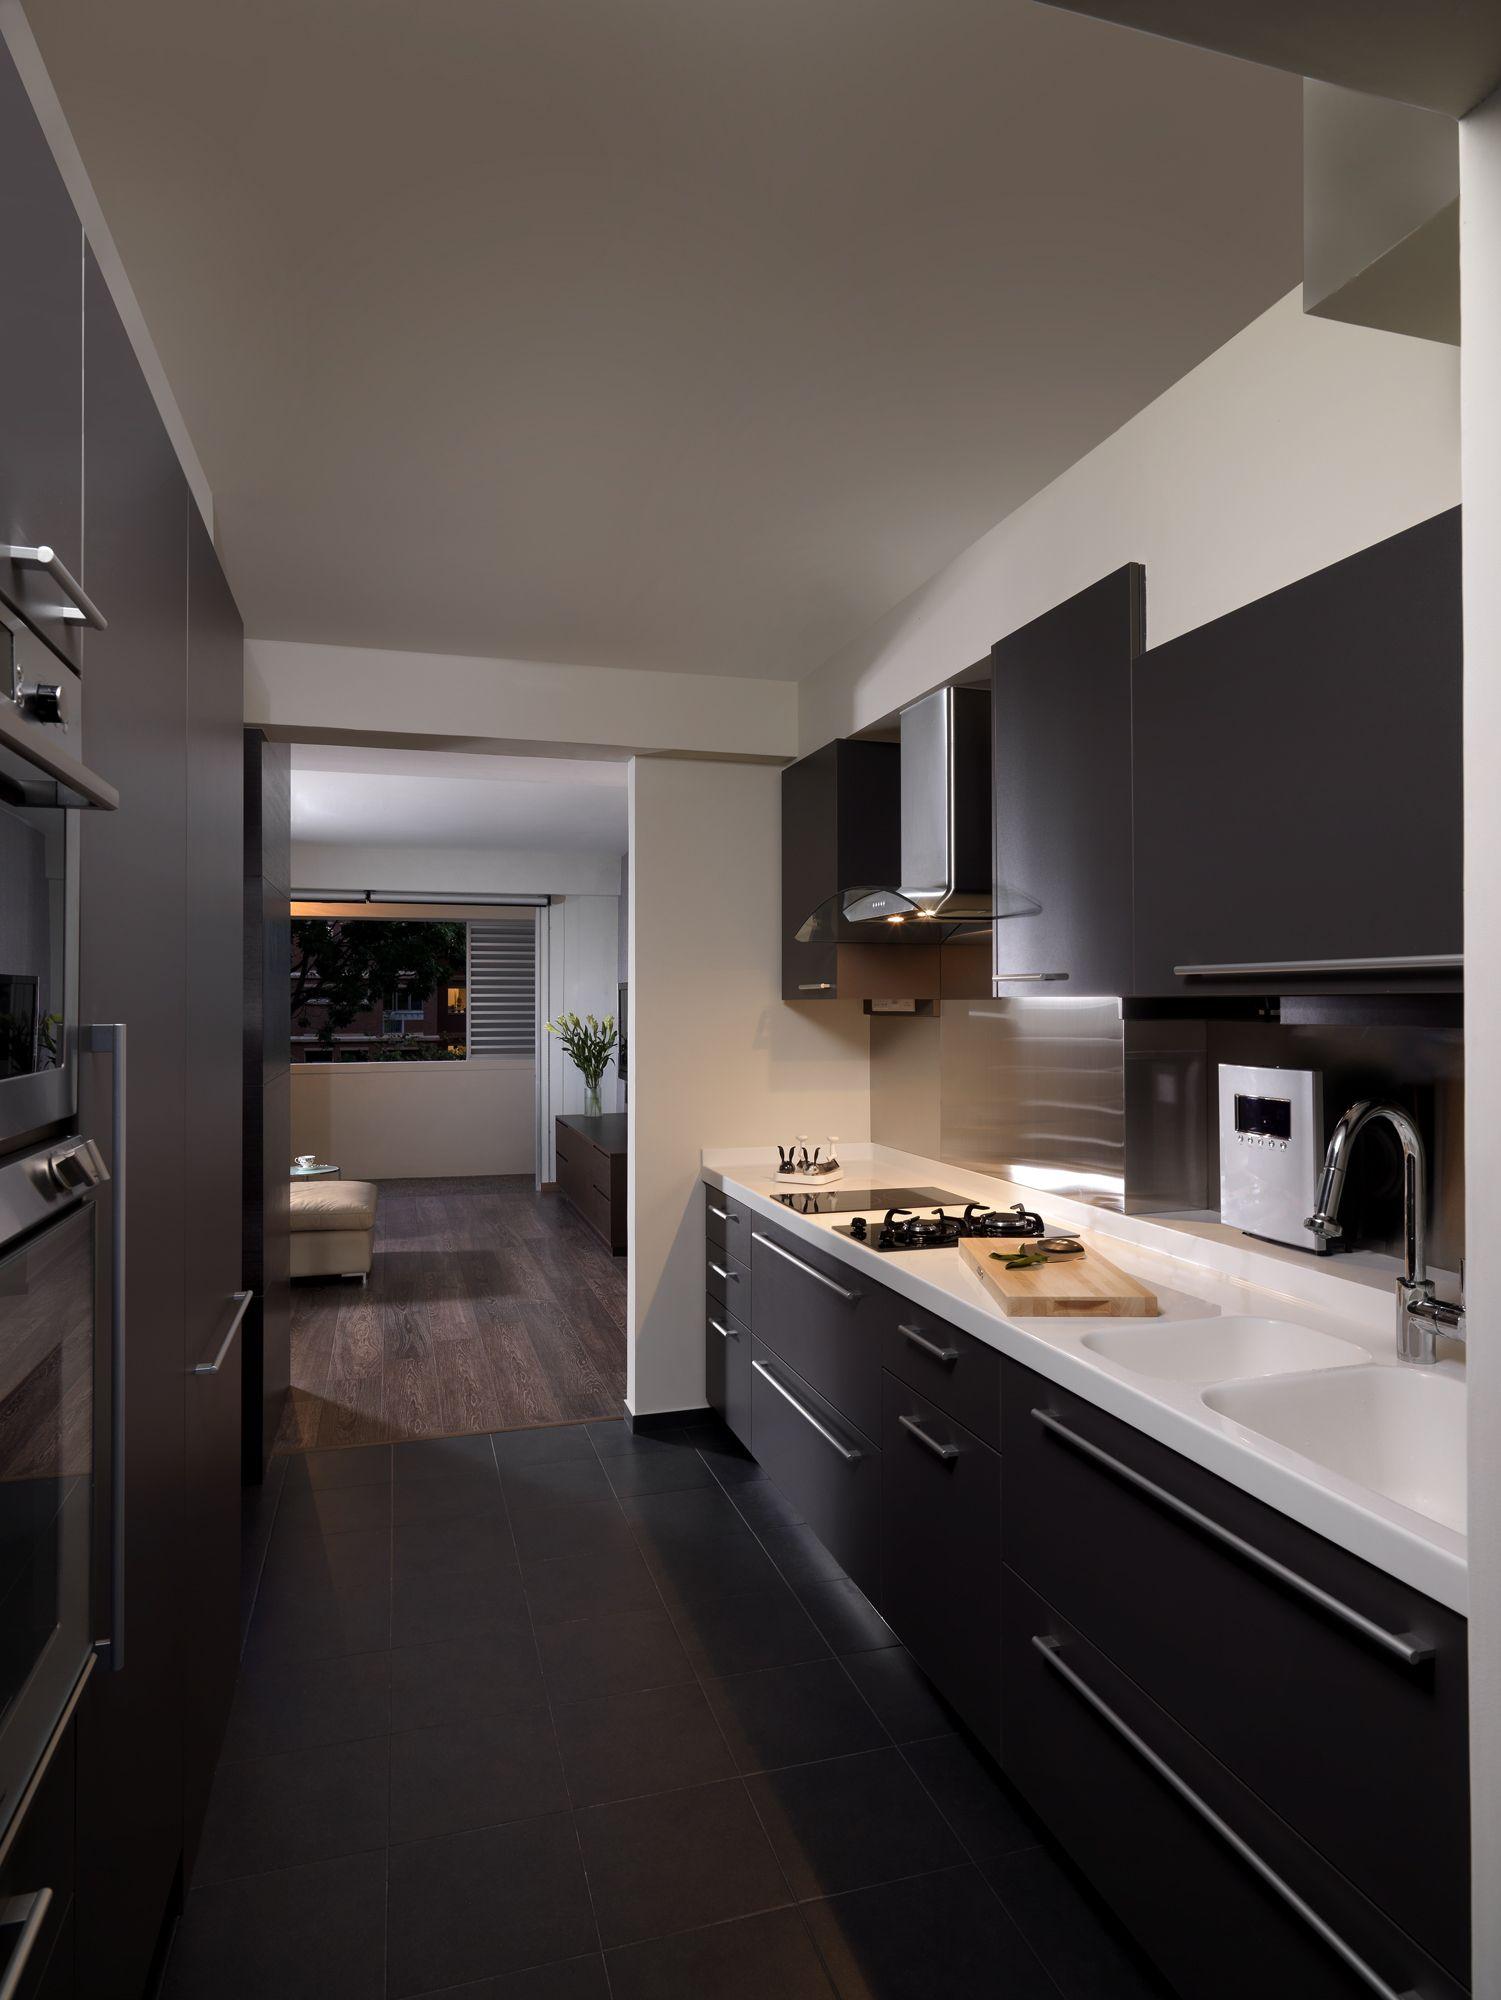 Kitchen | Home & Decor Singapore | Kitchen interior design ...